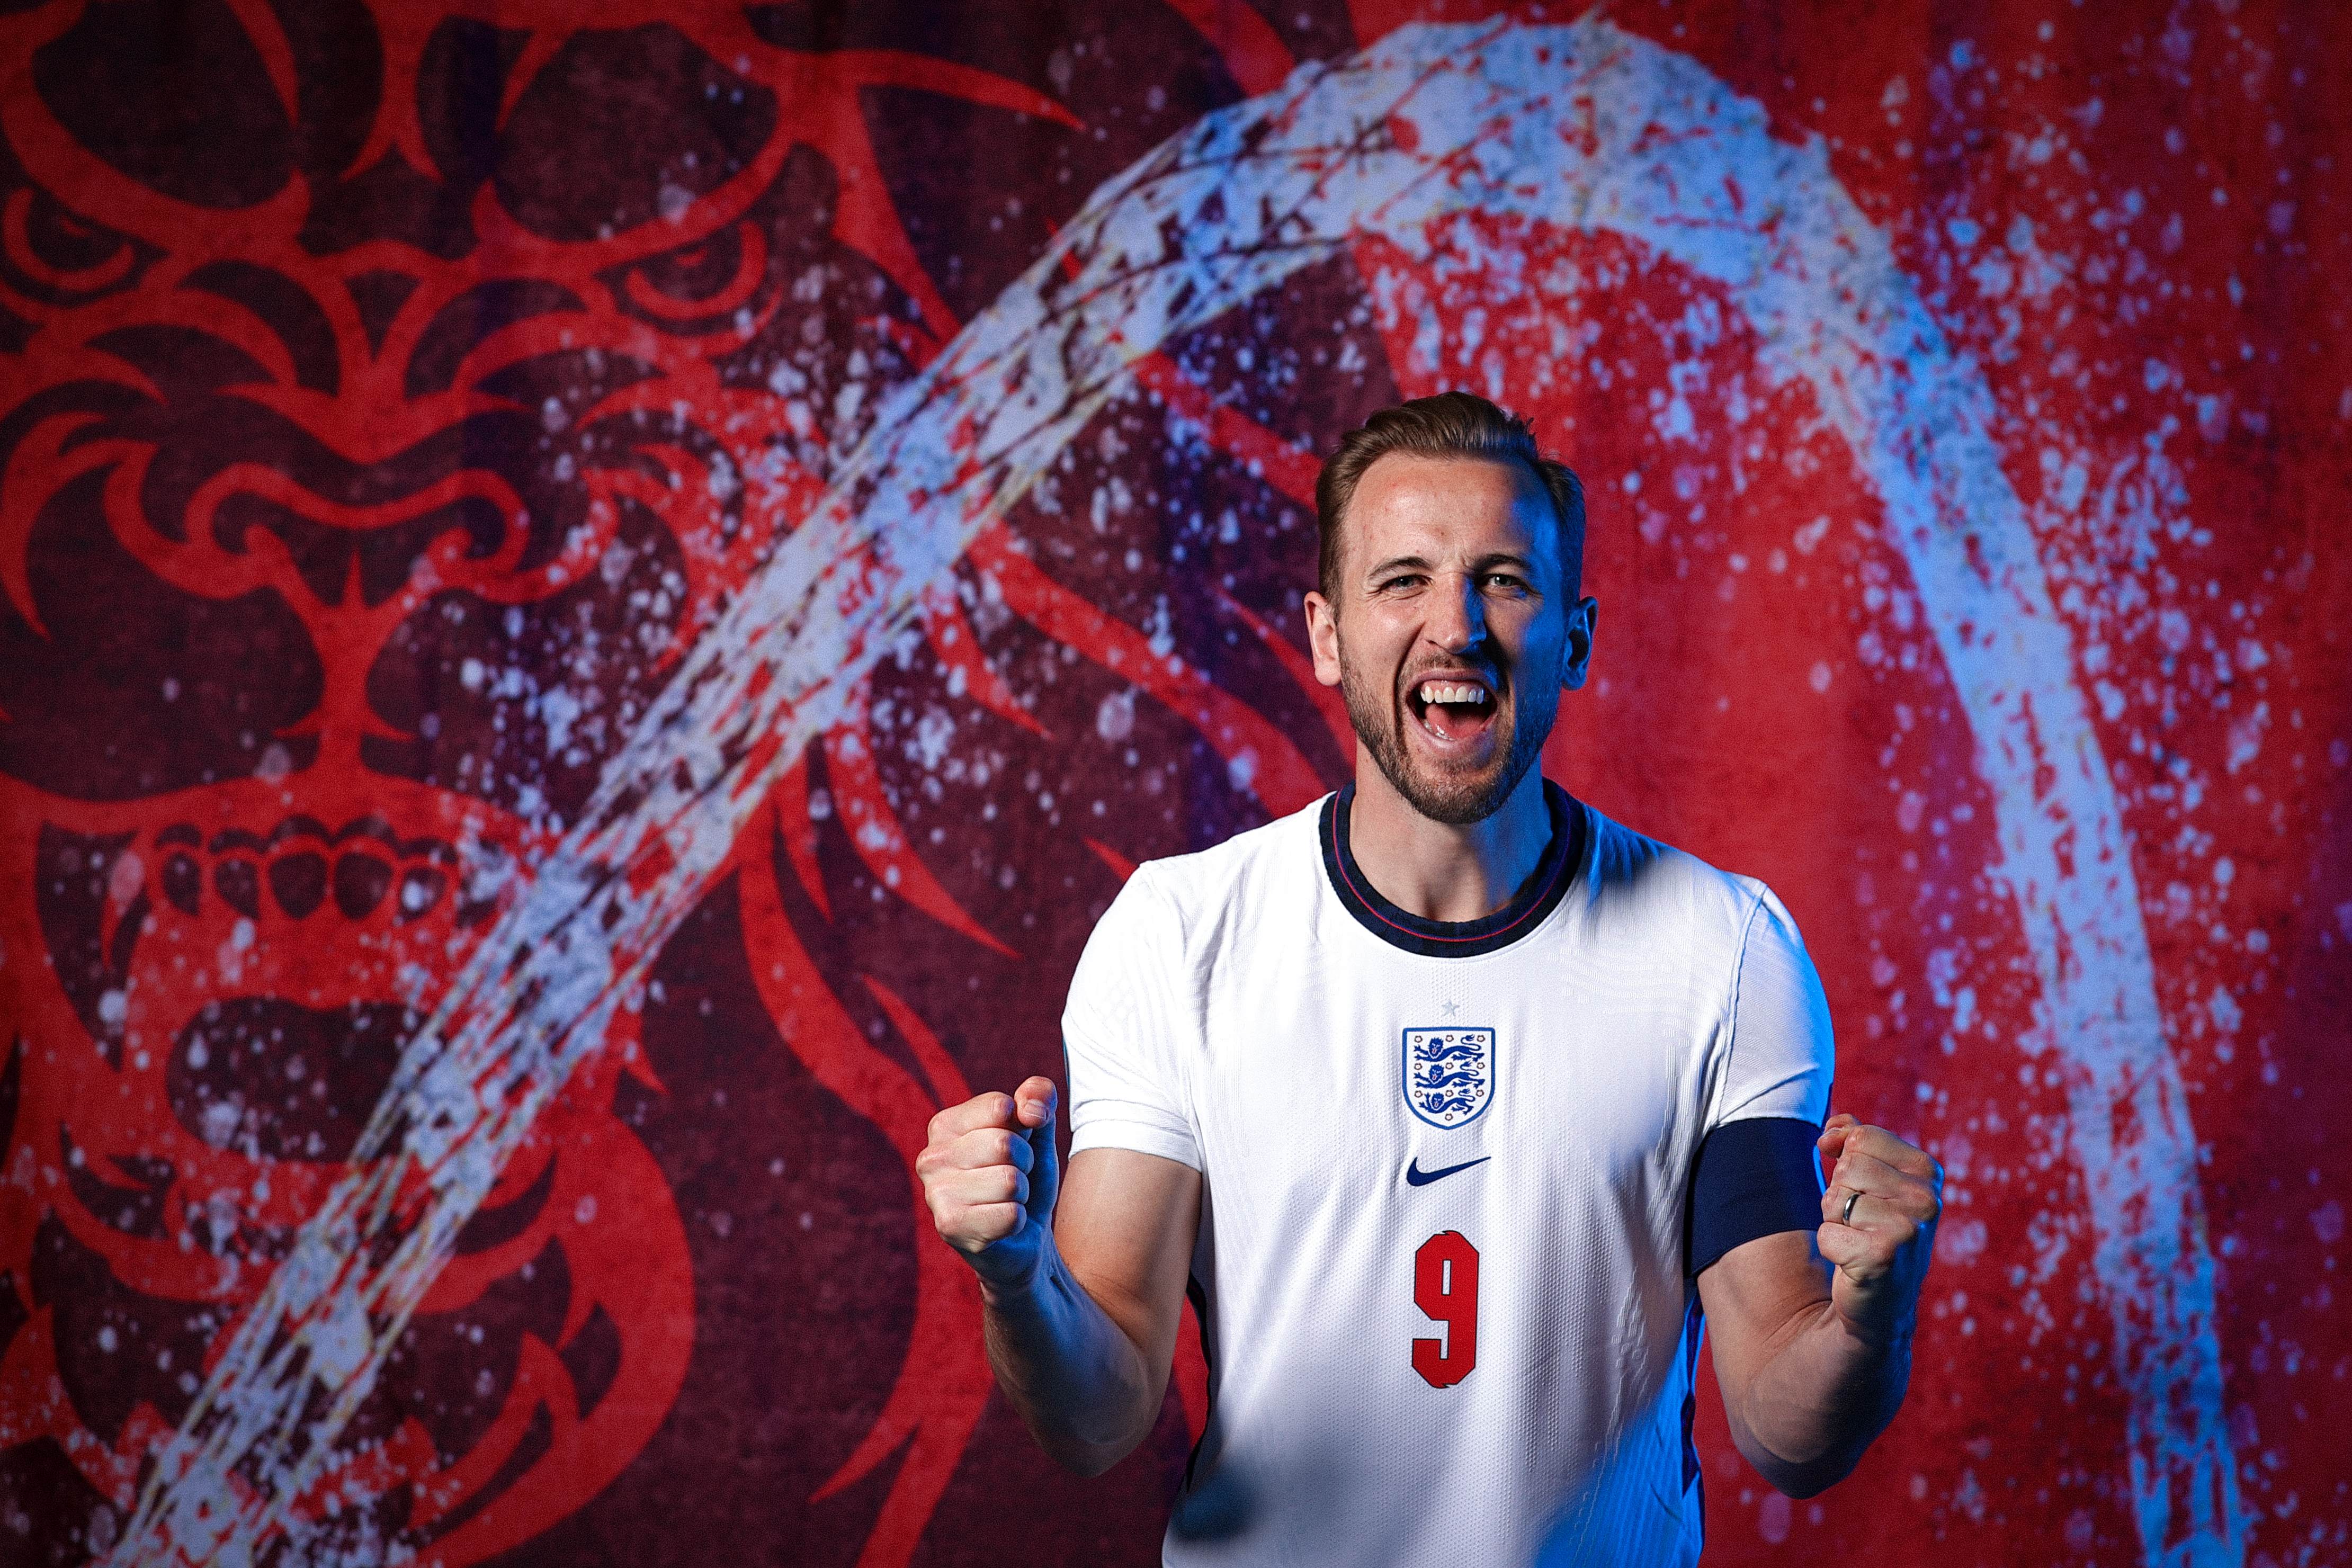 England Portraits - UEFA Euro 2020